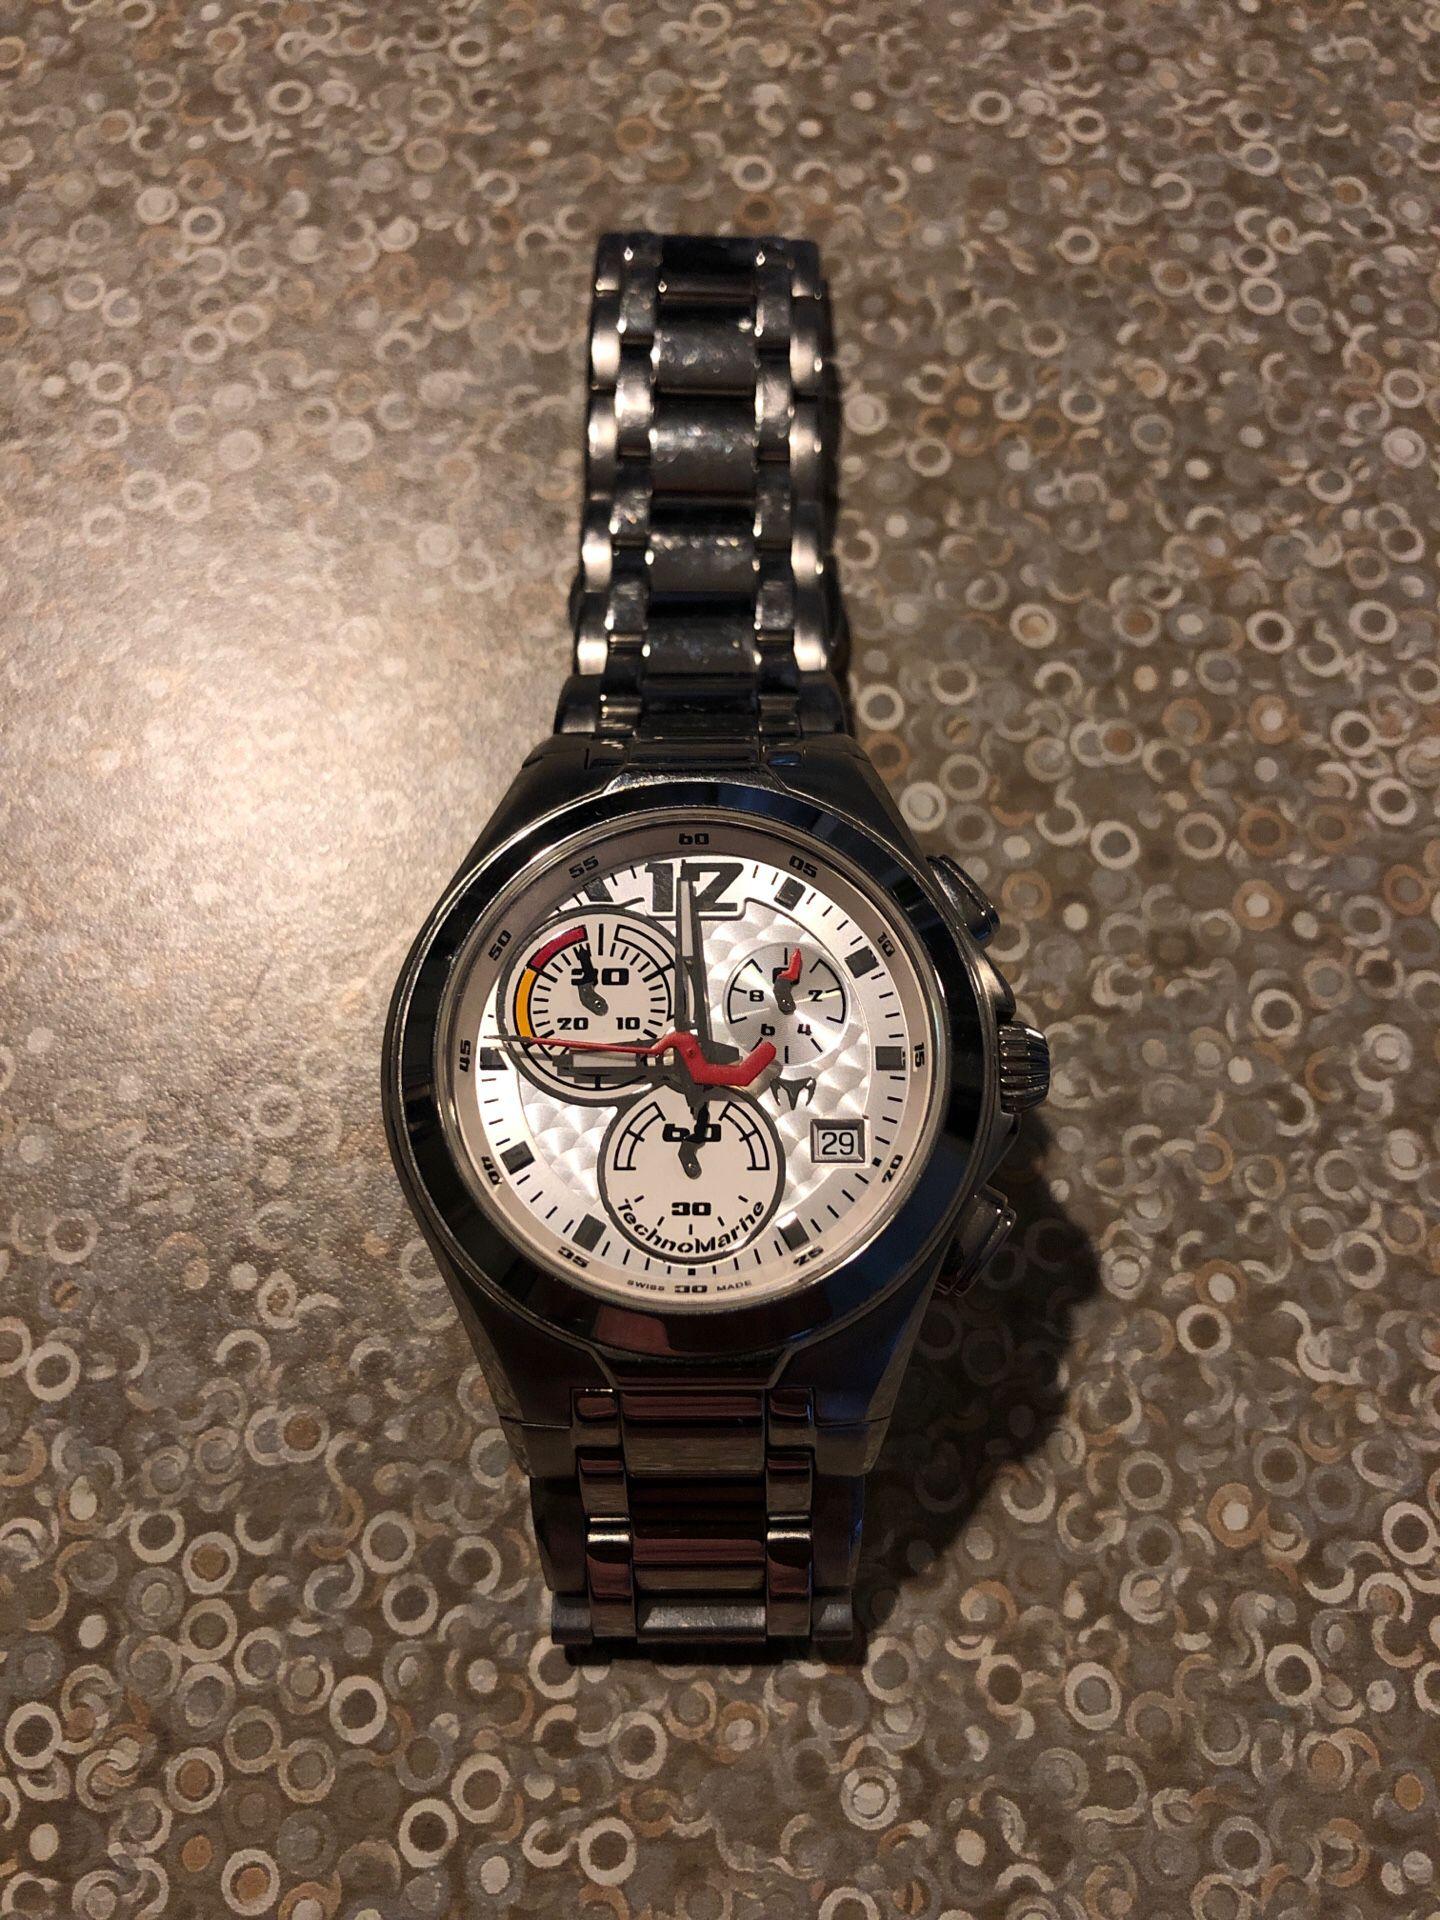 Reloj technomarine neo classic (original )